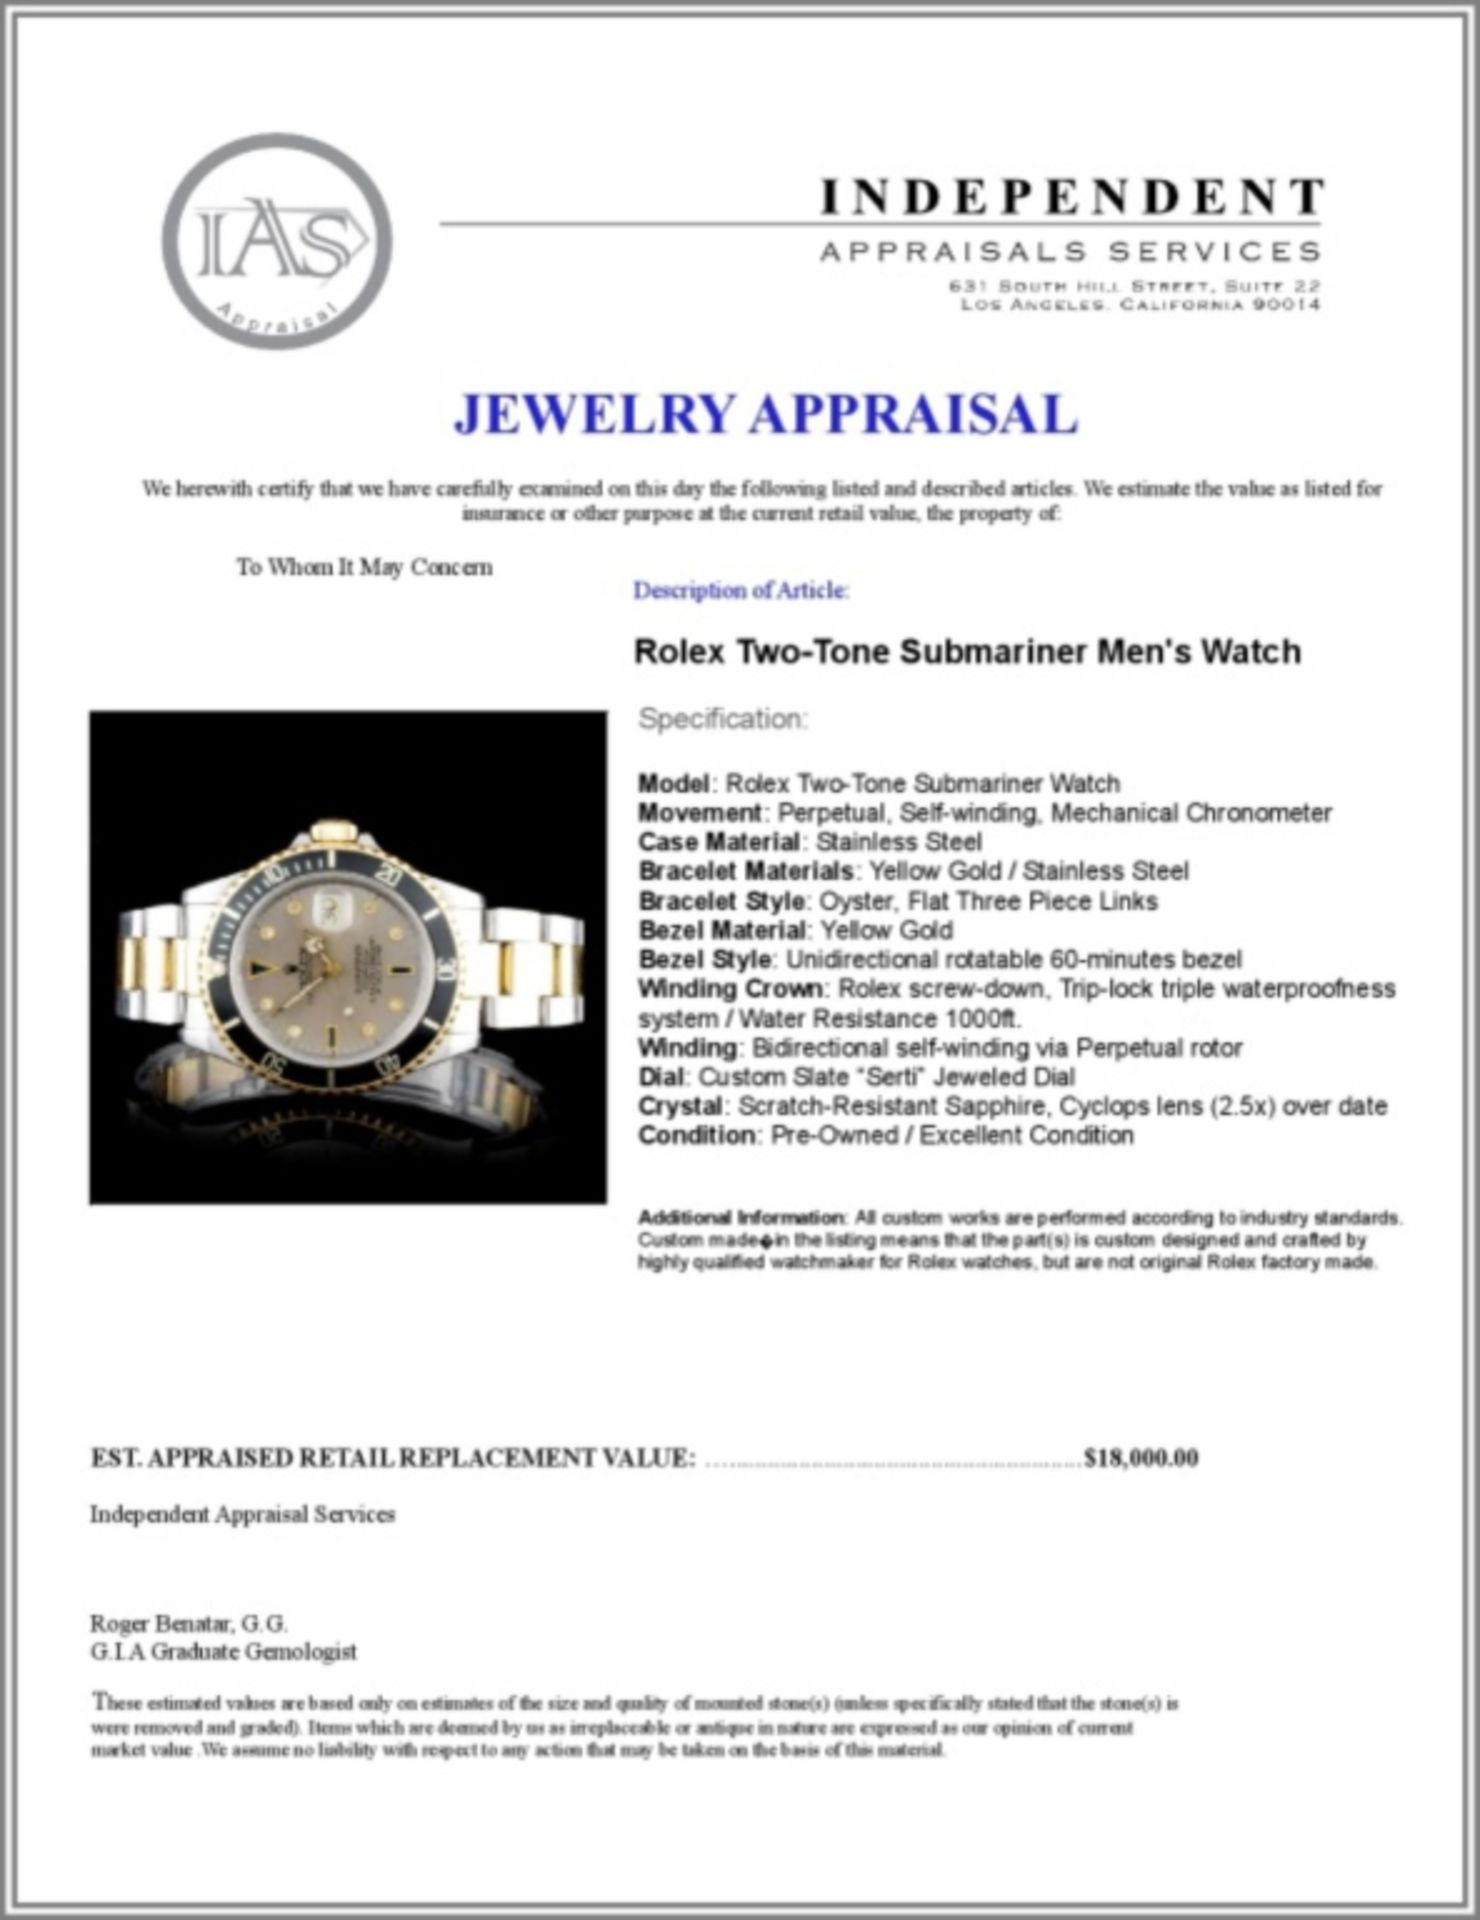 Rolex YG/SS Submariner Diamond 40MM Watch - Image 5 of 5